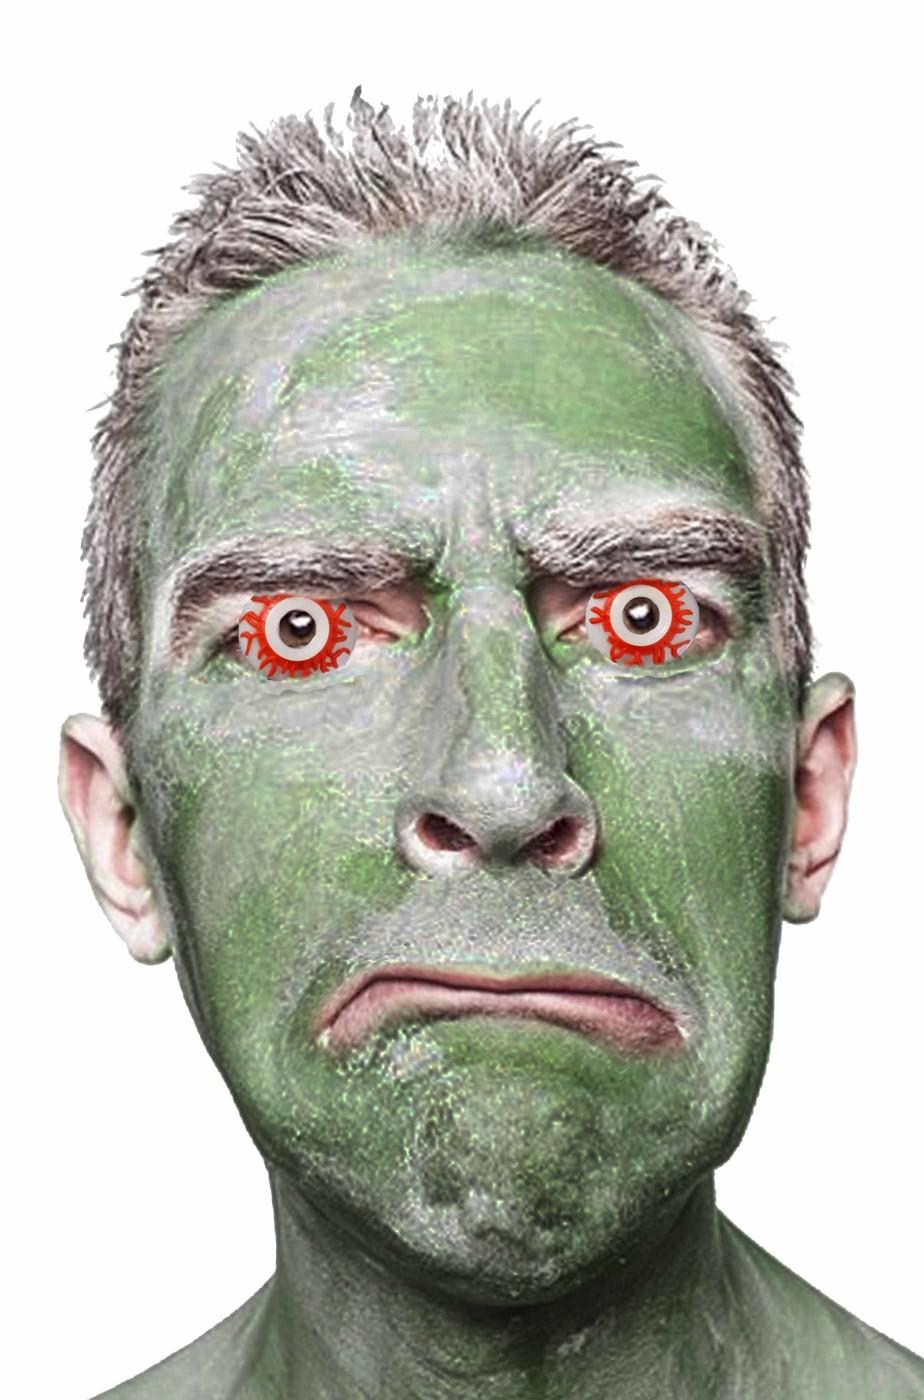 Occhi da zombie iniettati di sangue di plastica per adulti